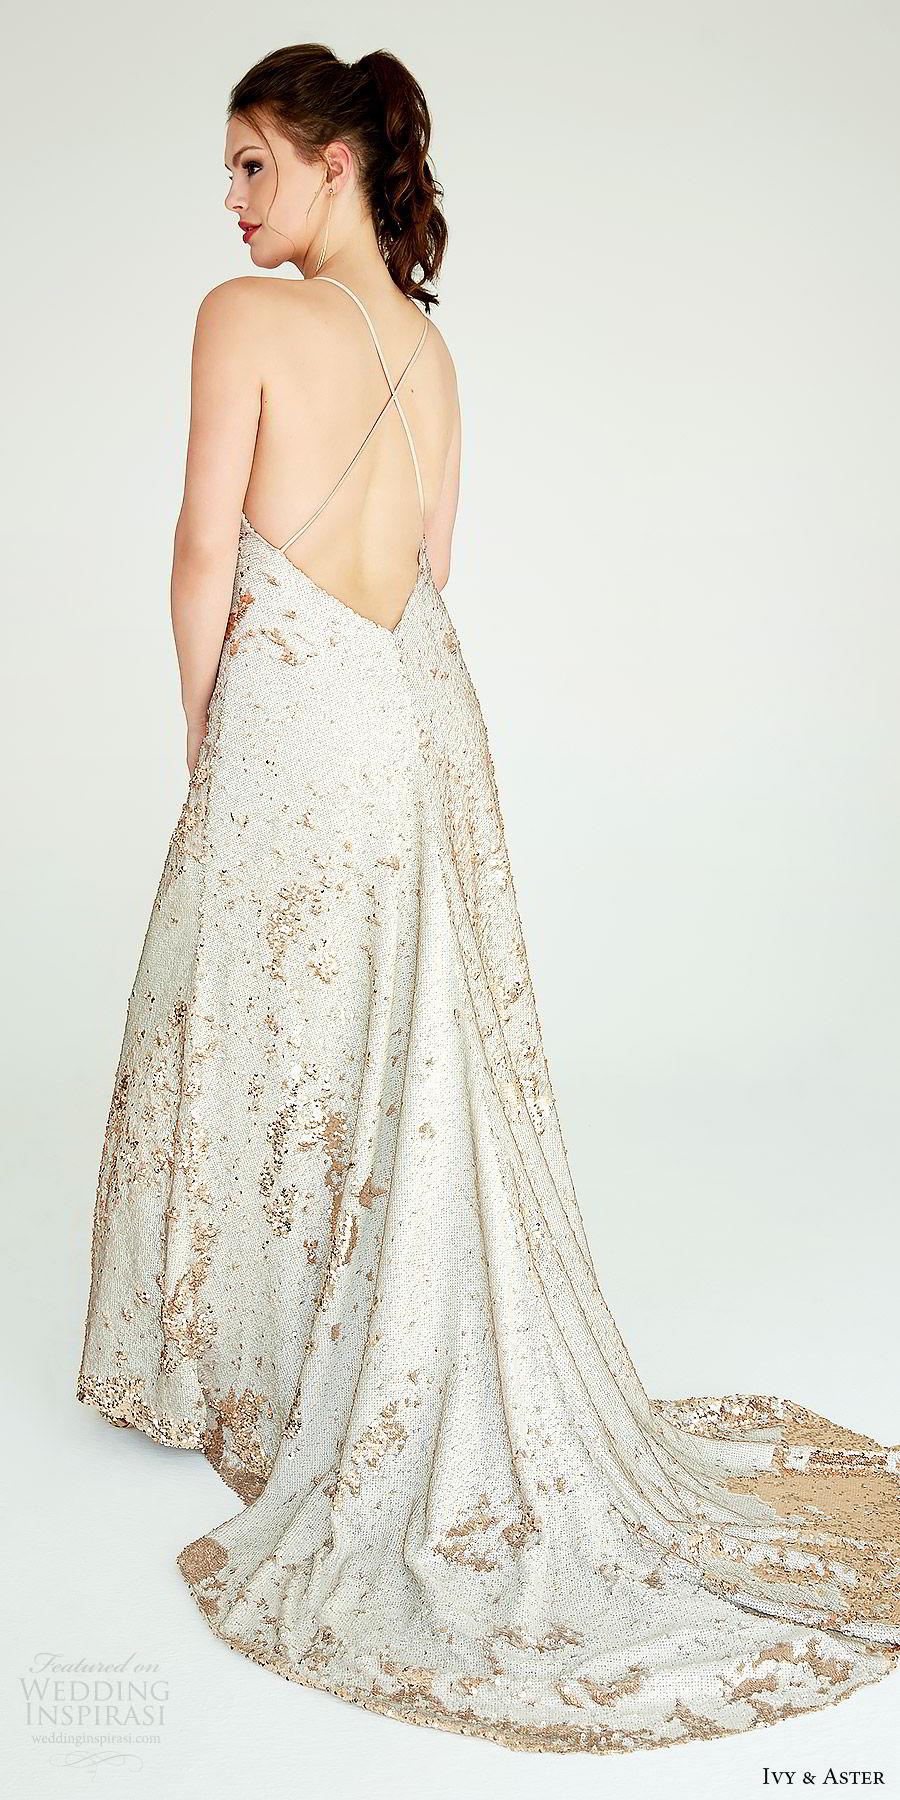 ivy aster bridal 2019 sleeveless spaghetti straps v neck fully embellished a line sheath wedding dress (zoe) bv low back chapel train modern chic